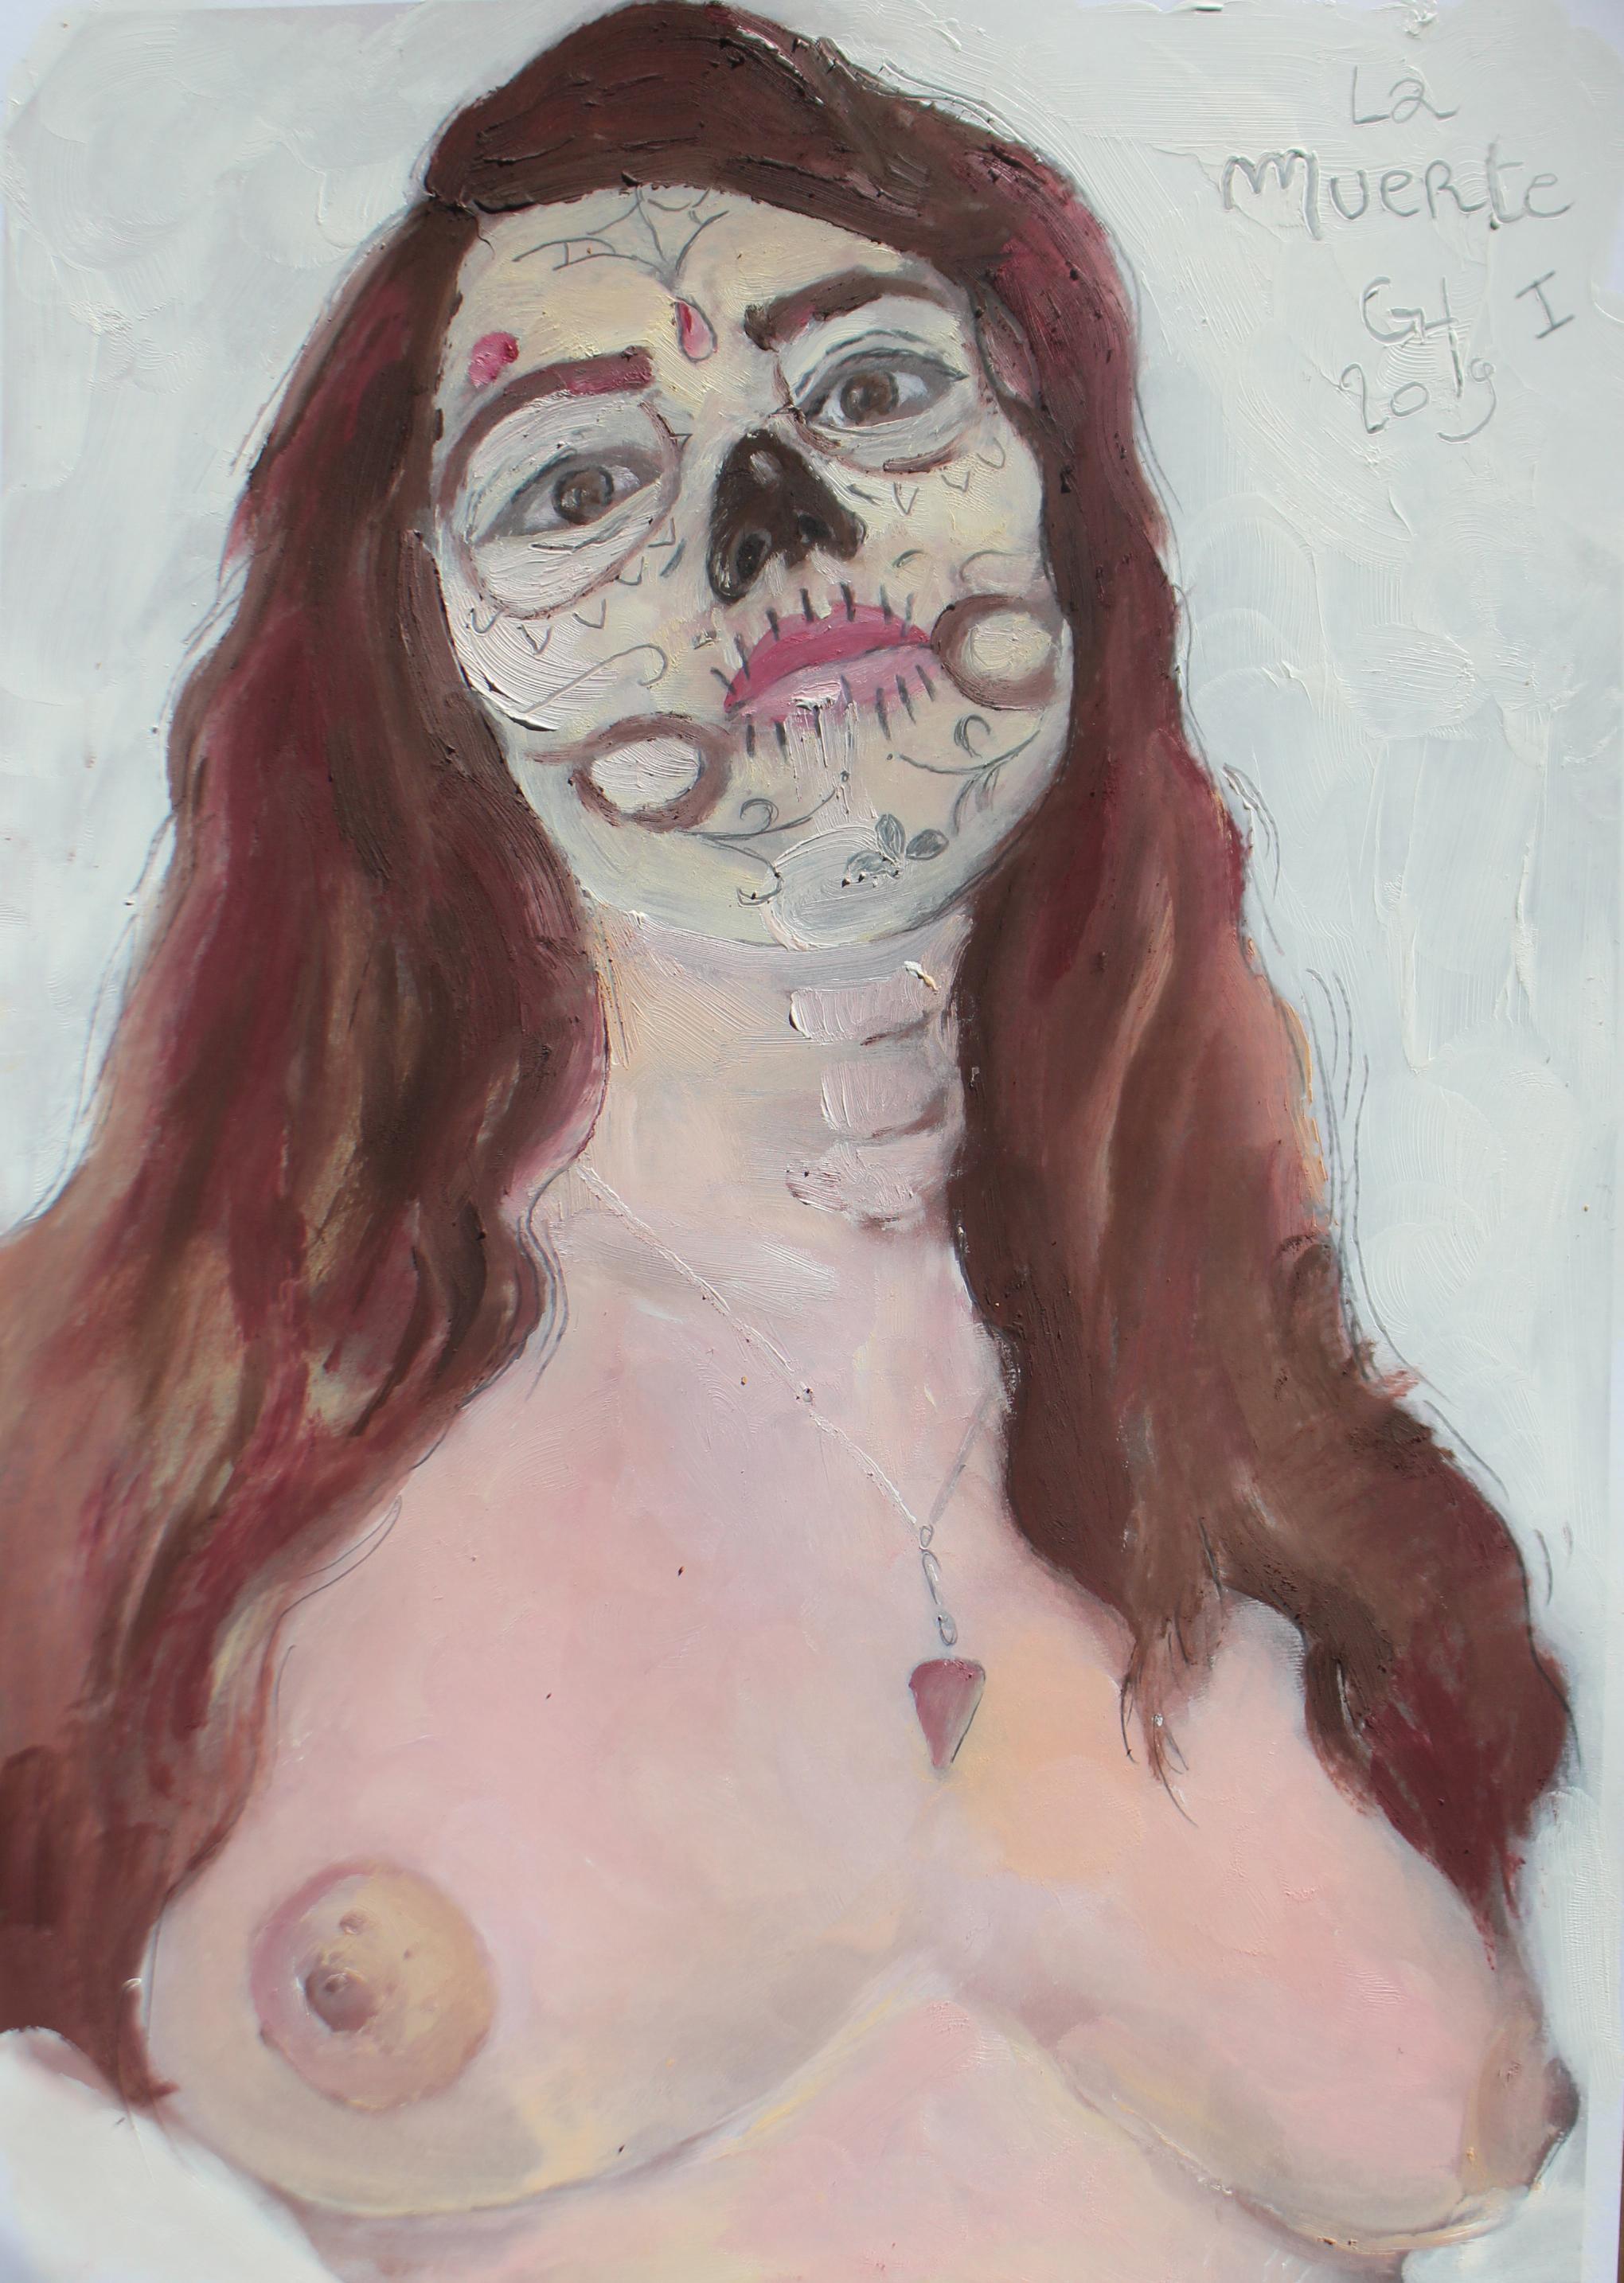 La_muerte_-_Grégory_Huck